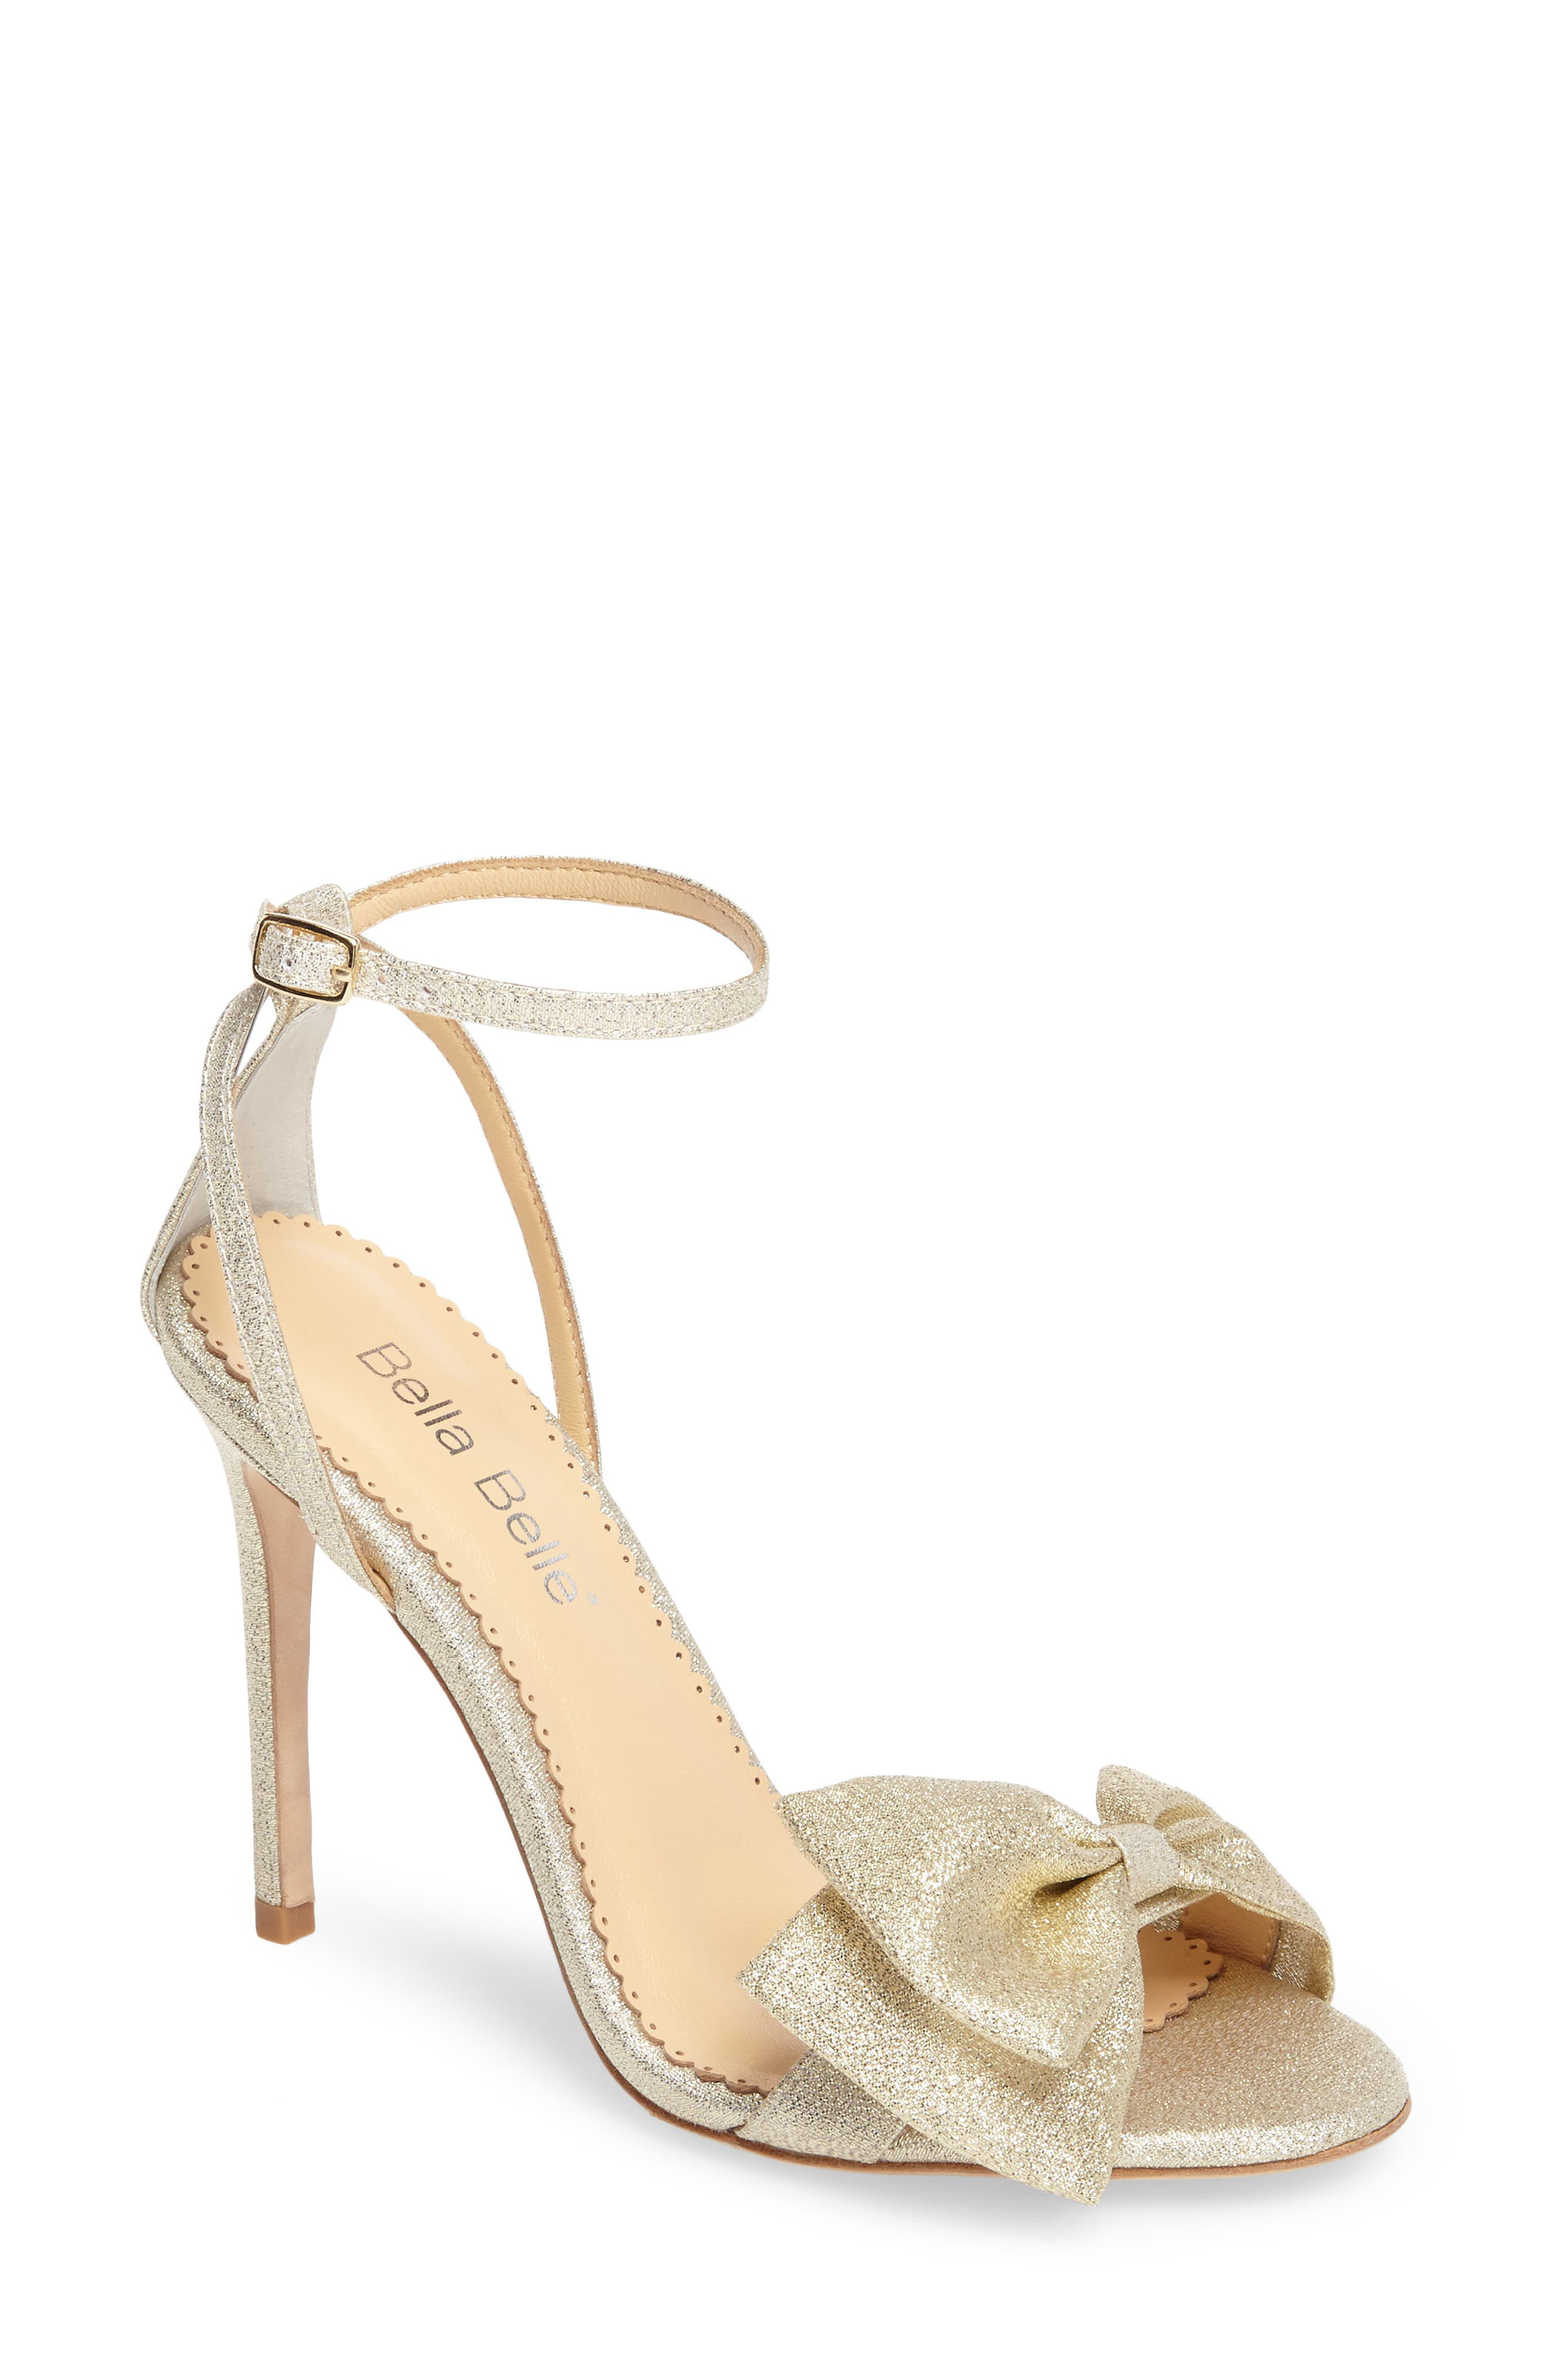 Aubrey Bow Ankle Strap Sandal,                         Main,                         color, GOLD